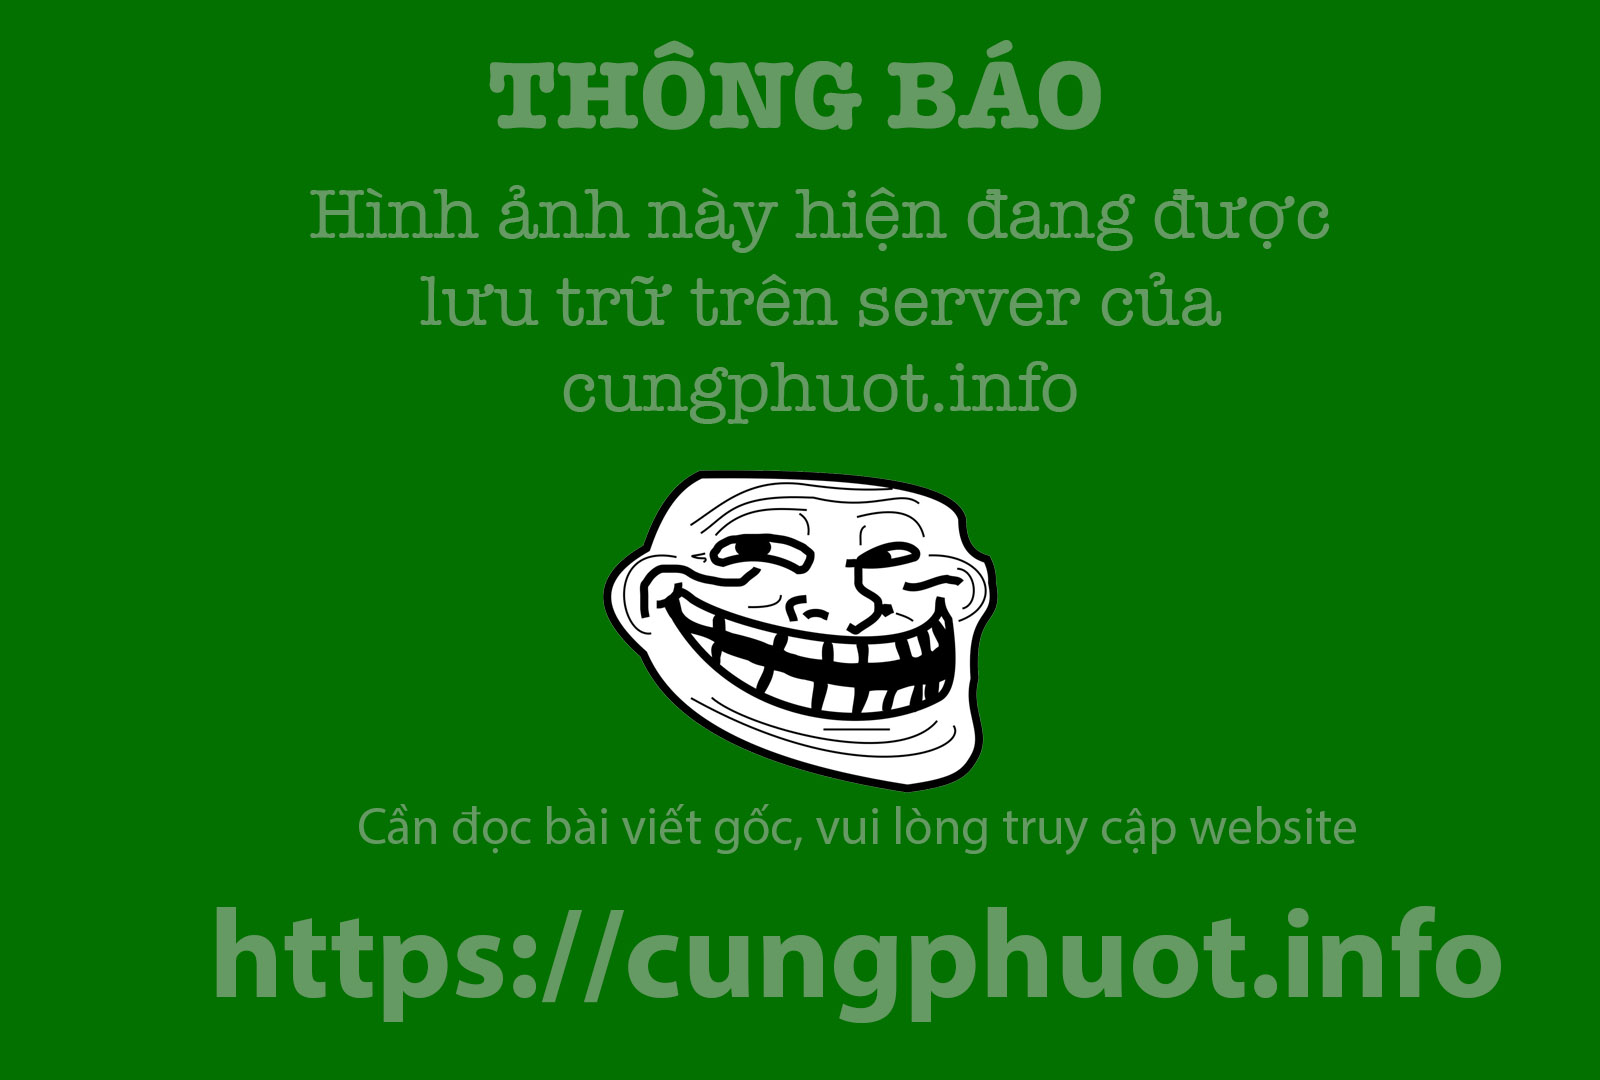 Ảnh: hanh_bamboo